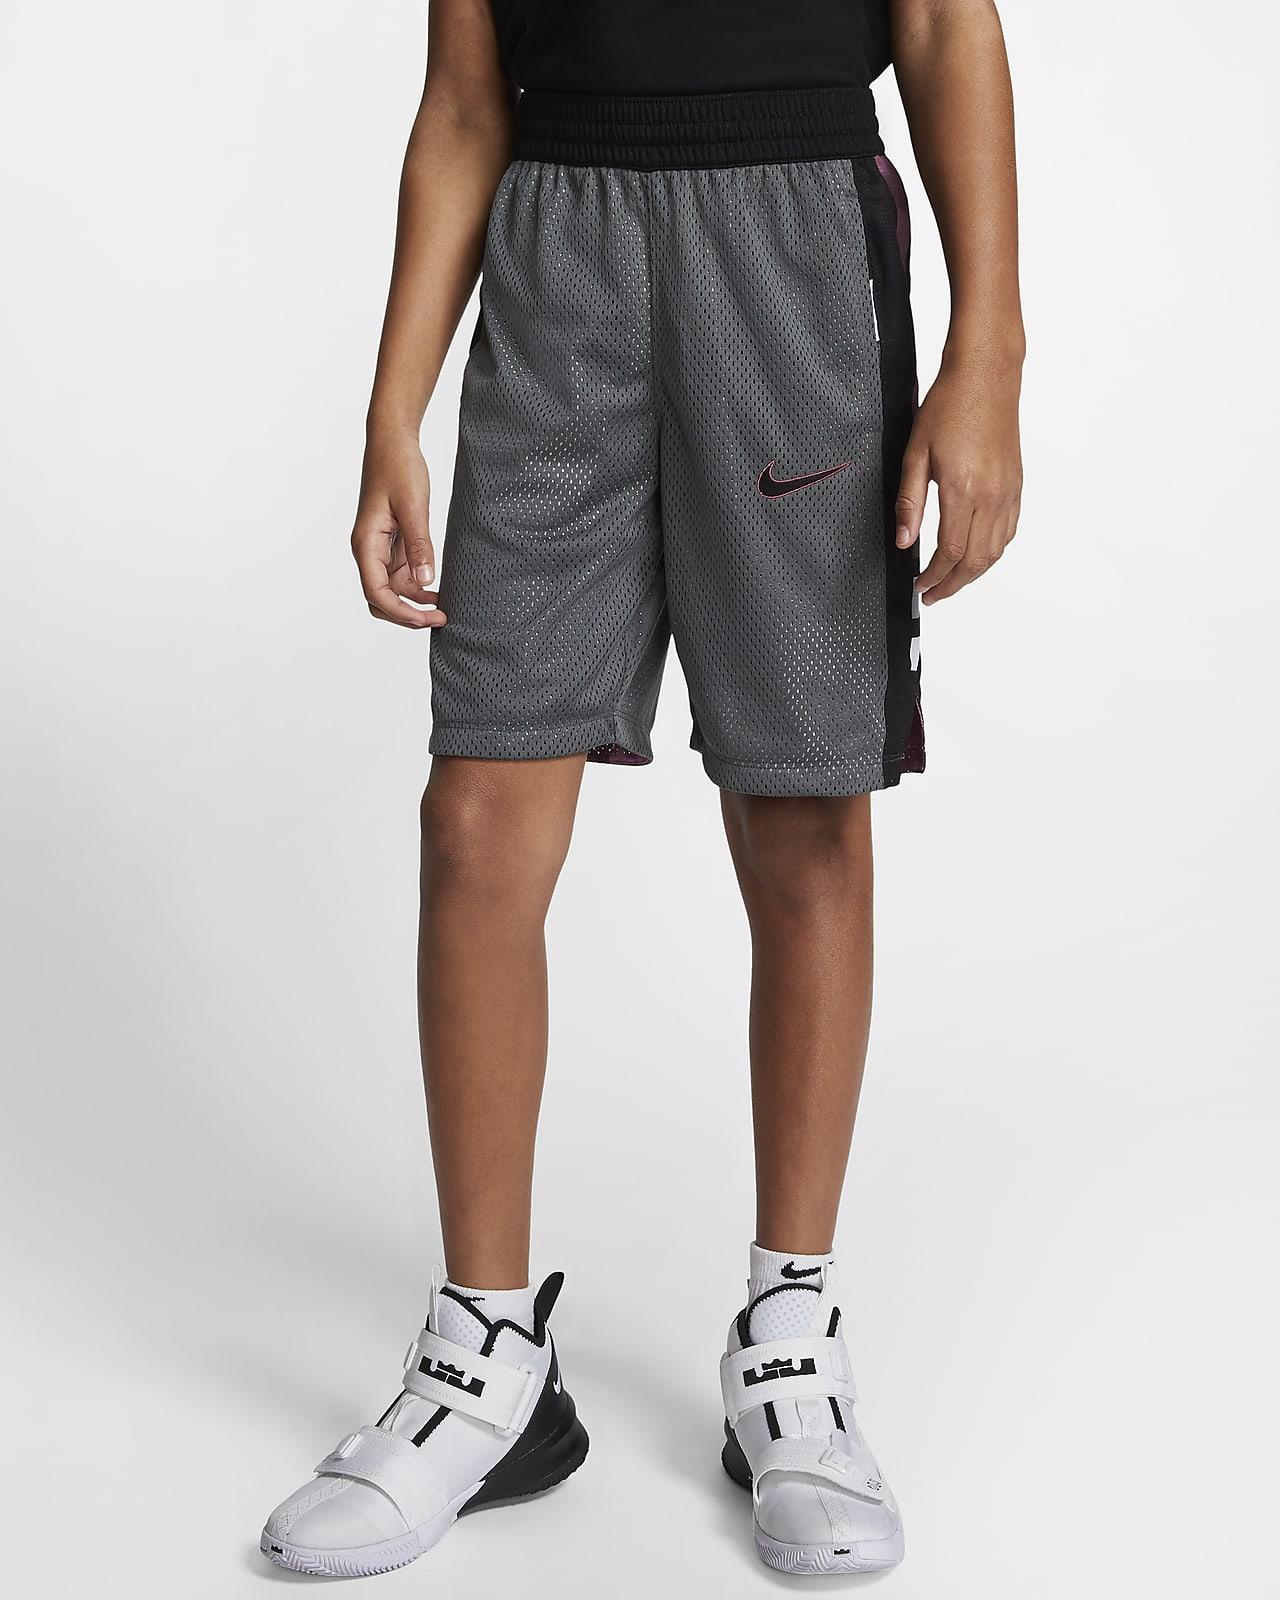 Nike Elite Big Kids' (Boys') Reversible Basketball Shorts